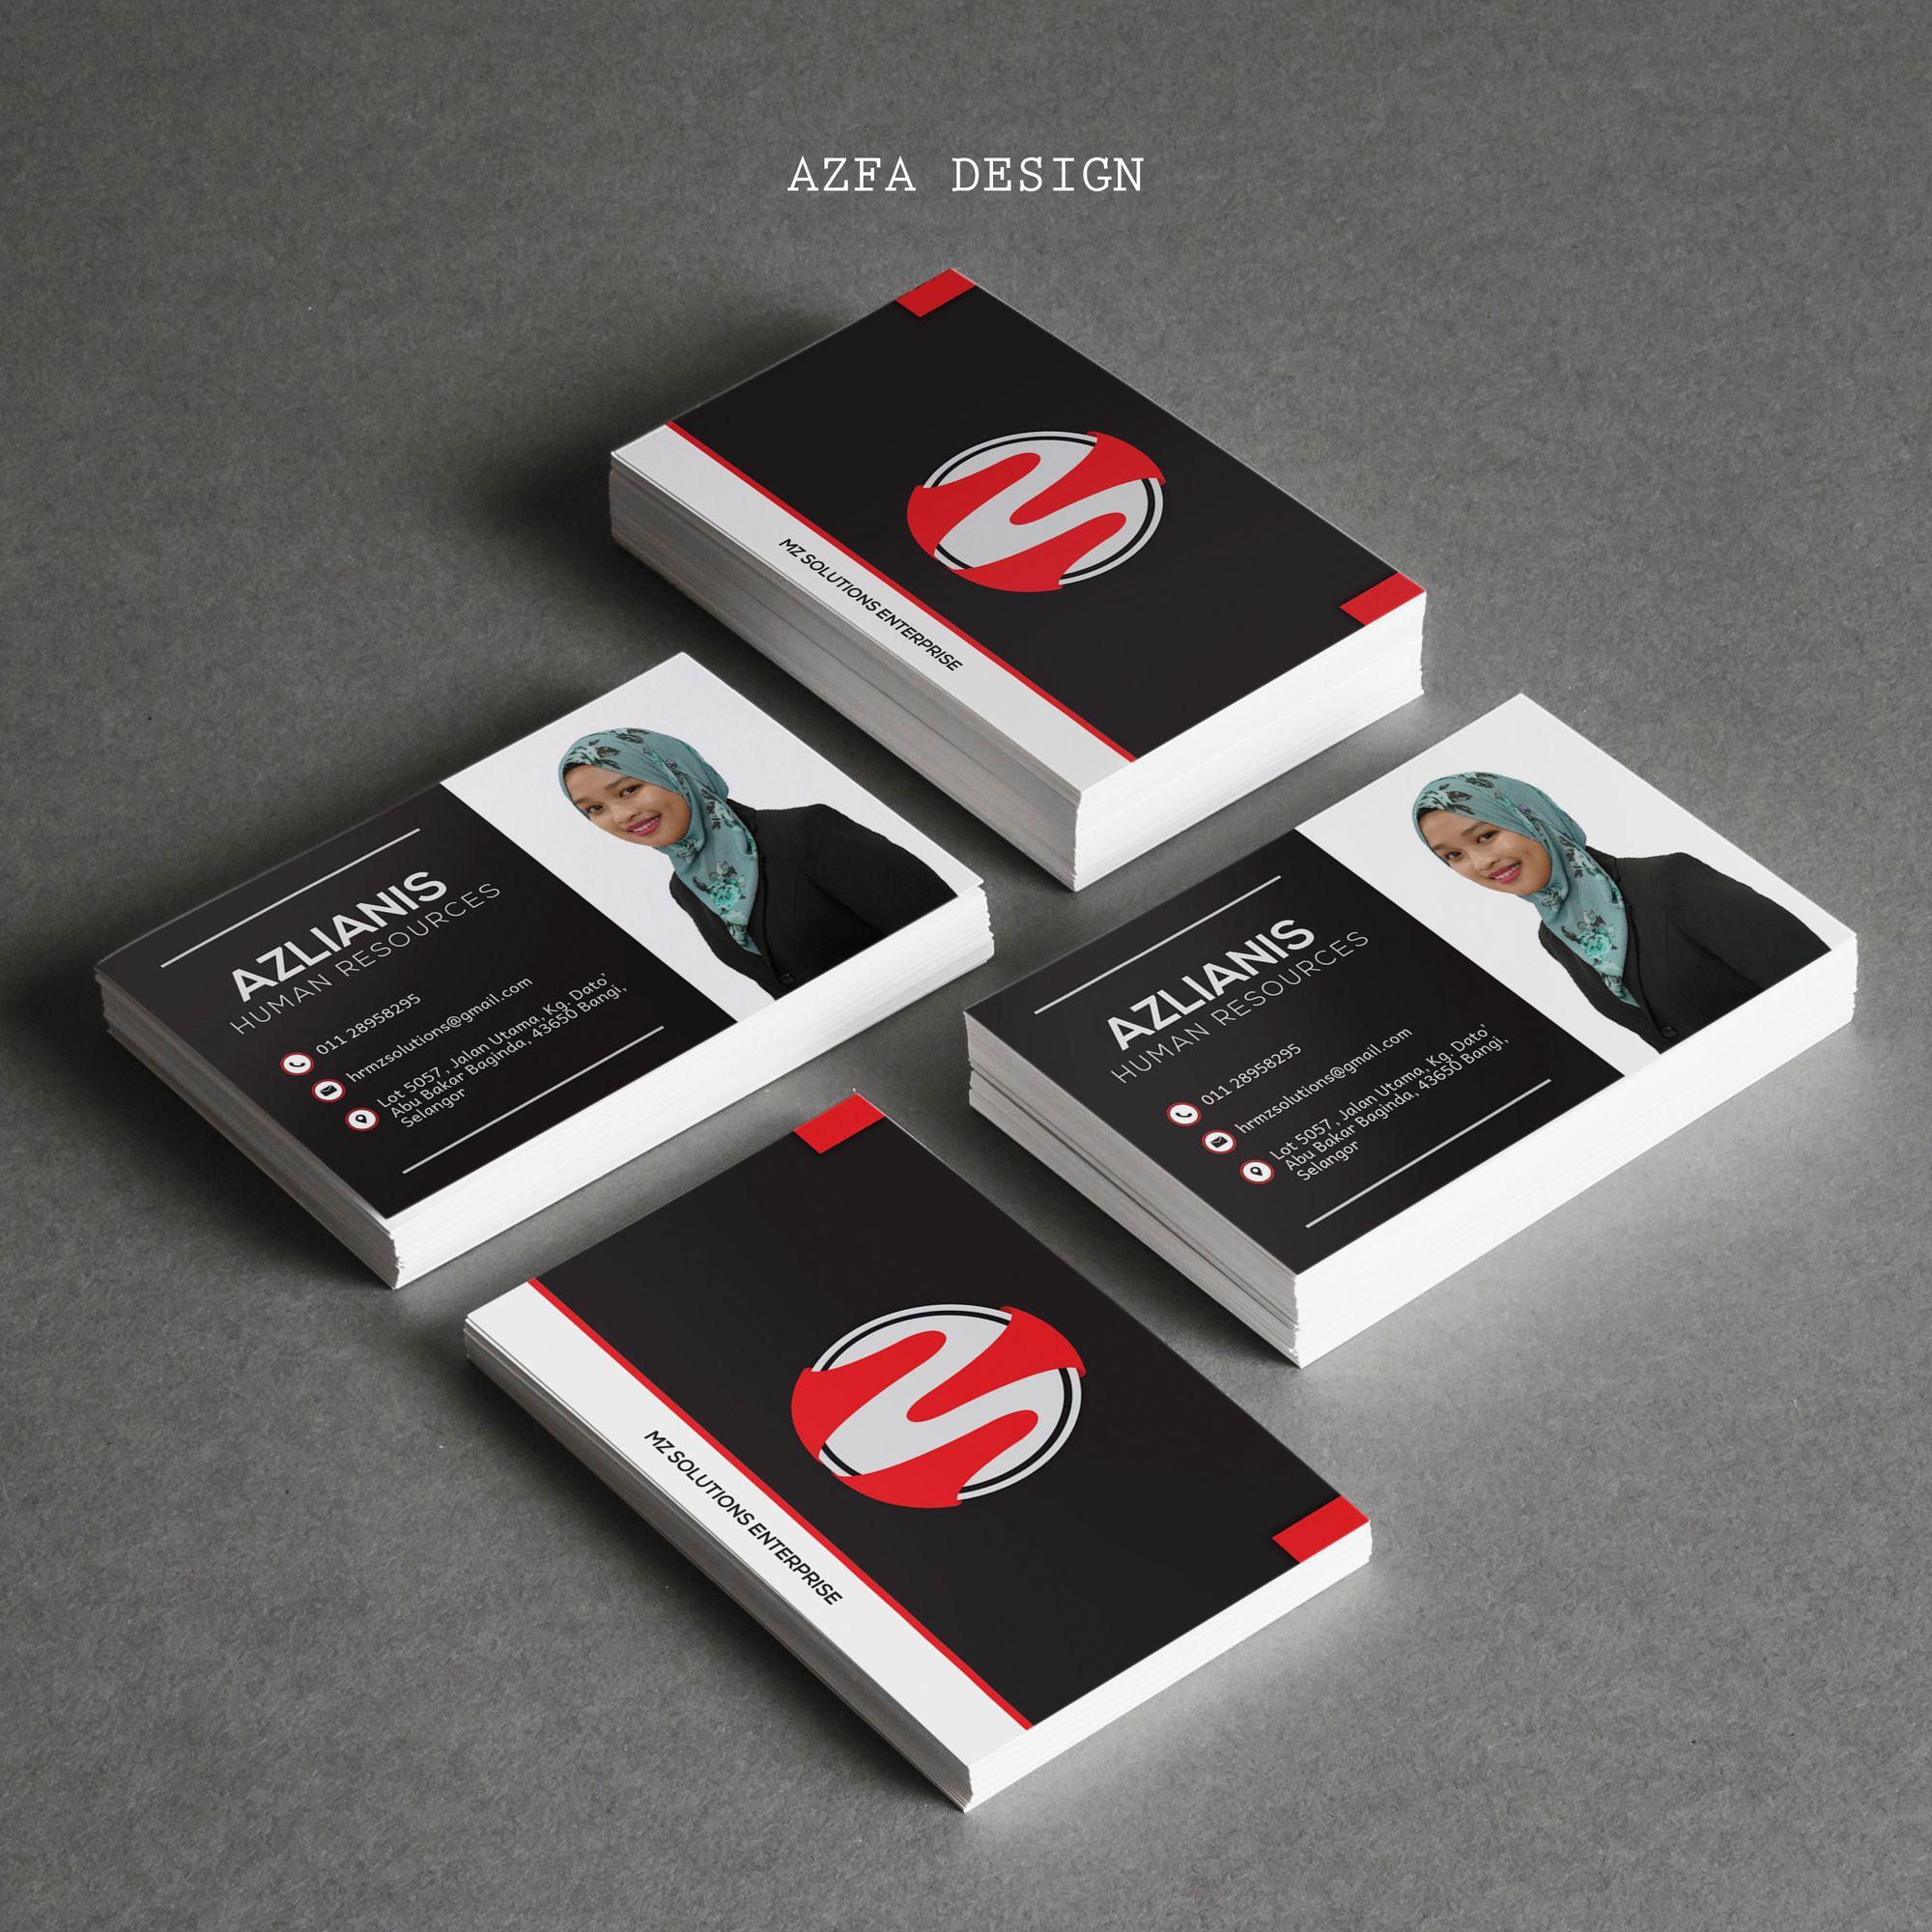 Azfadesign Bisneskad Anda Mahu Nampak Profesional Miliki Bisnes Kad Anda Sekarang B Human Resources Cards Business Cards